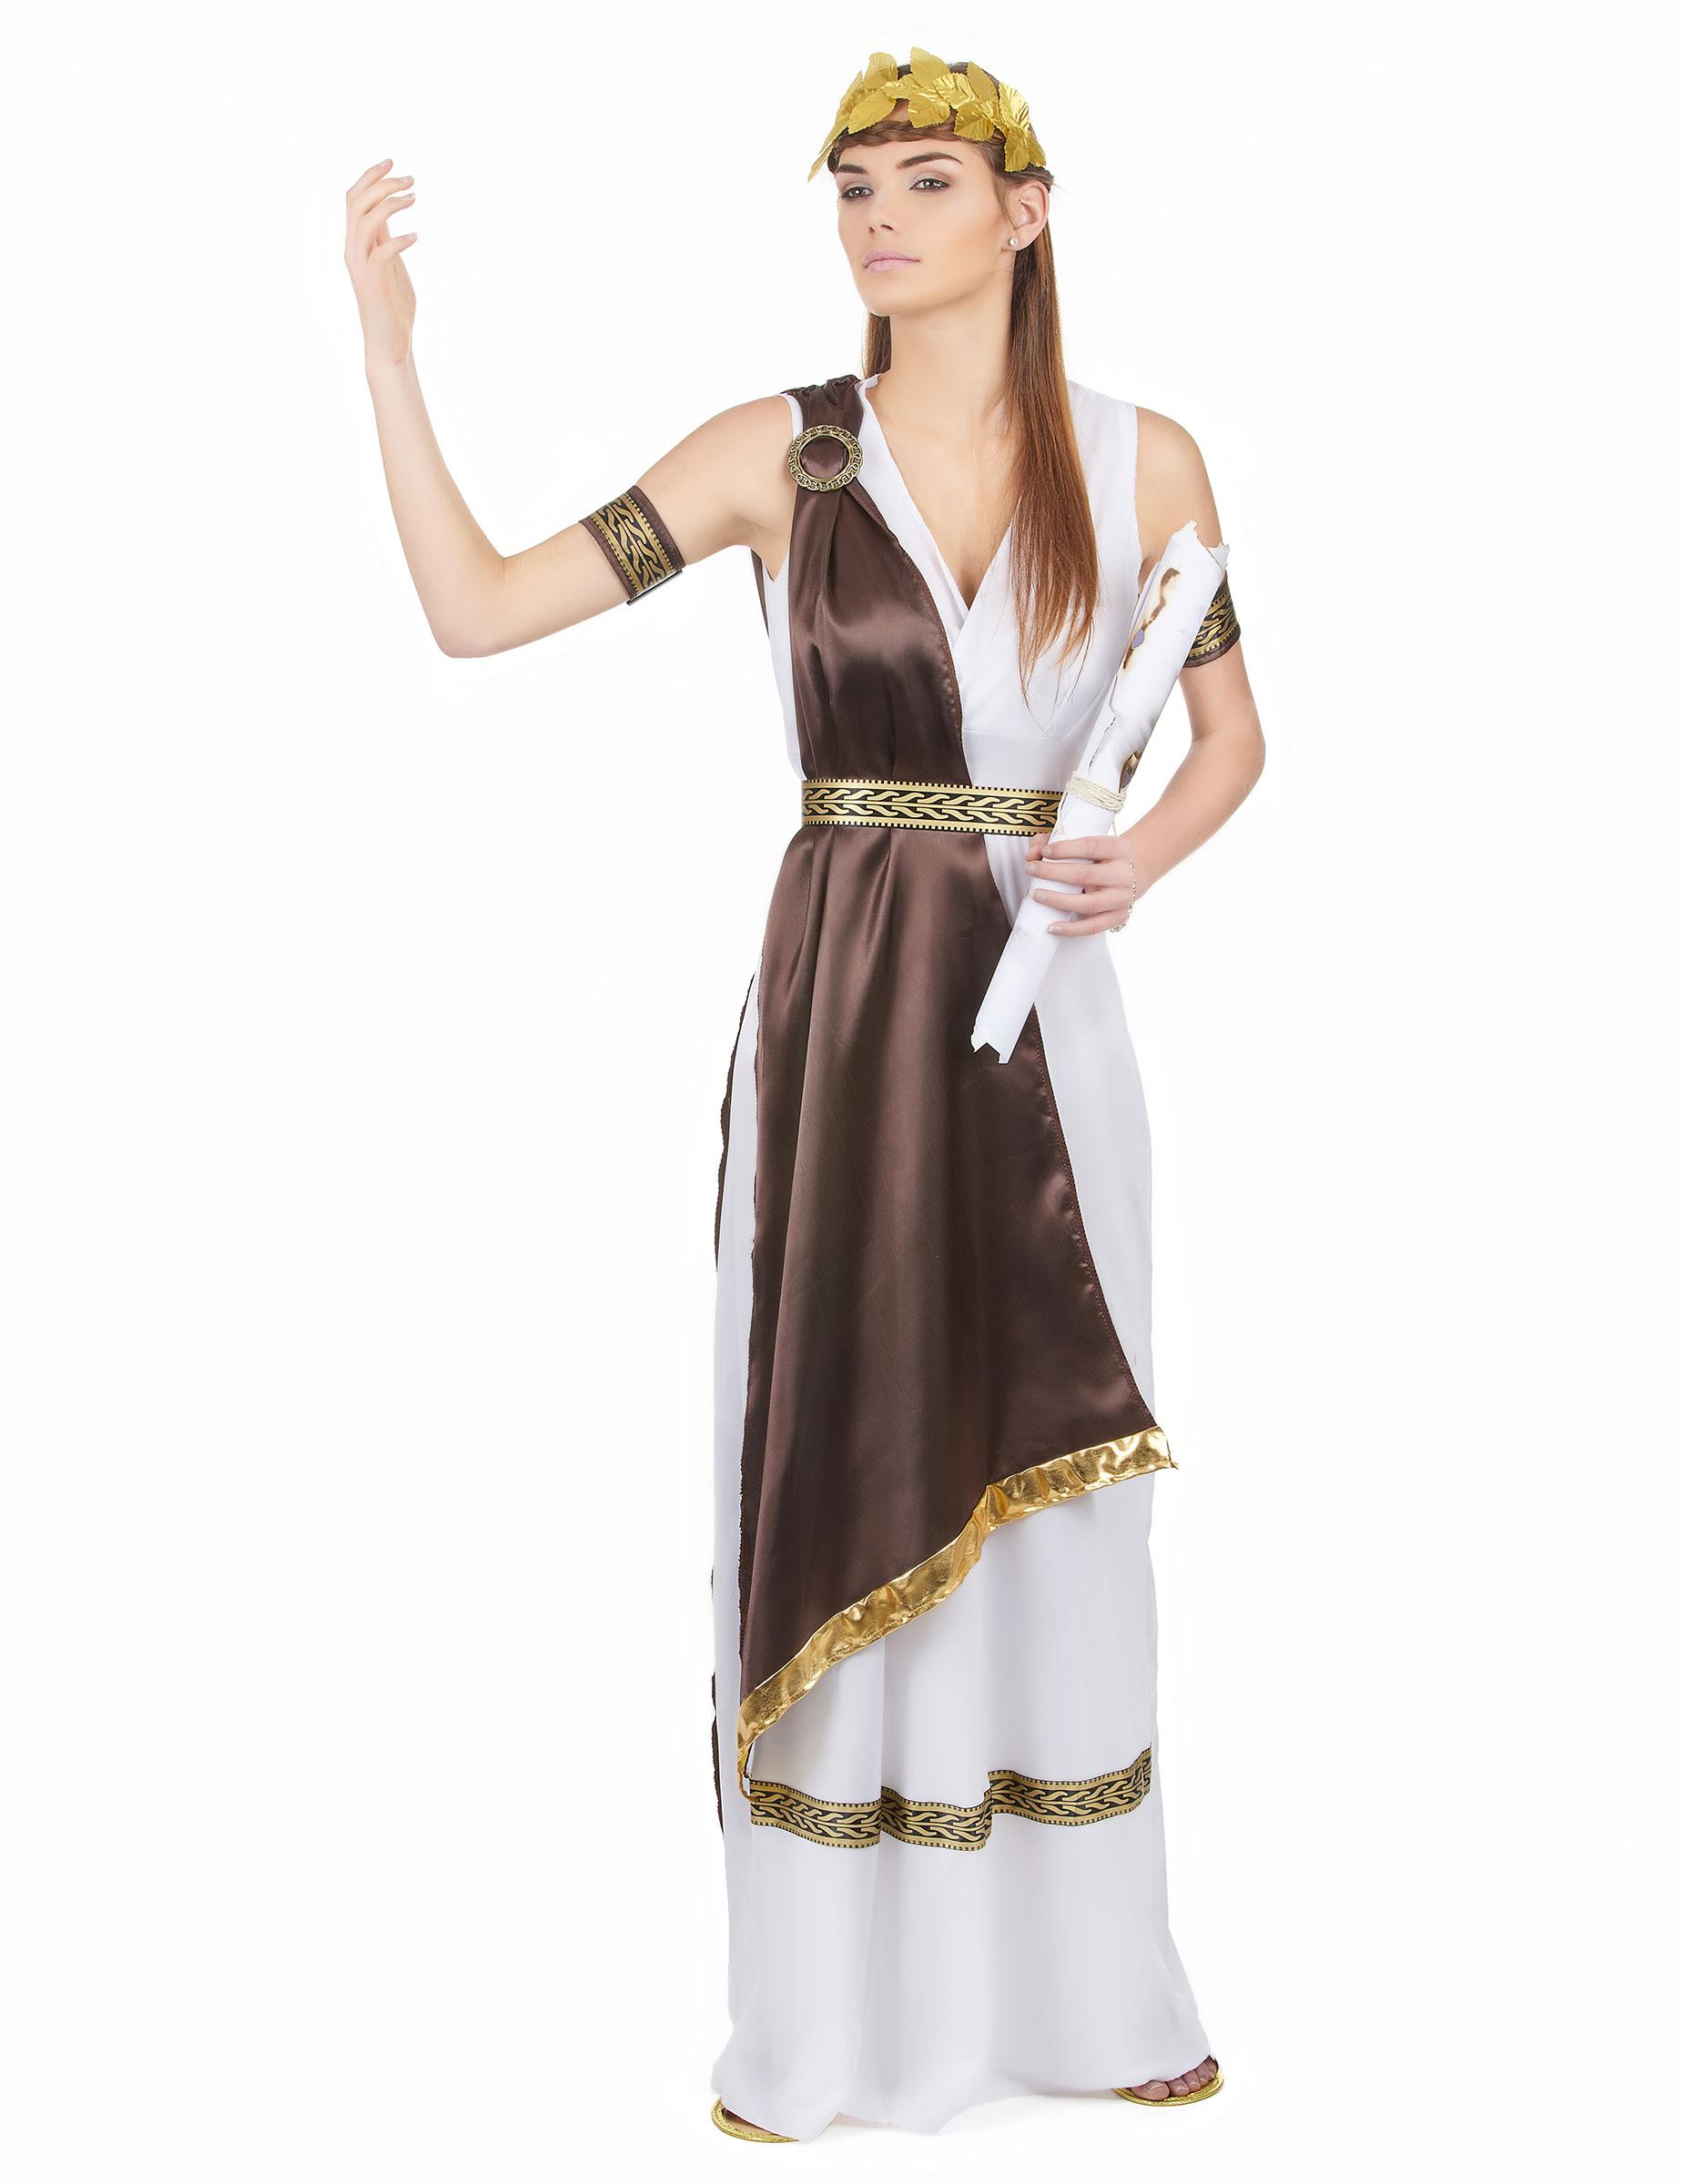 20ad26c5b202 Costume antica romana adulto  Costumi adulti